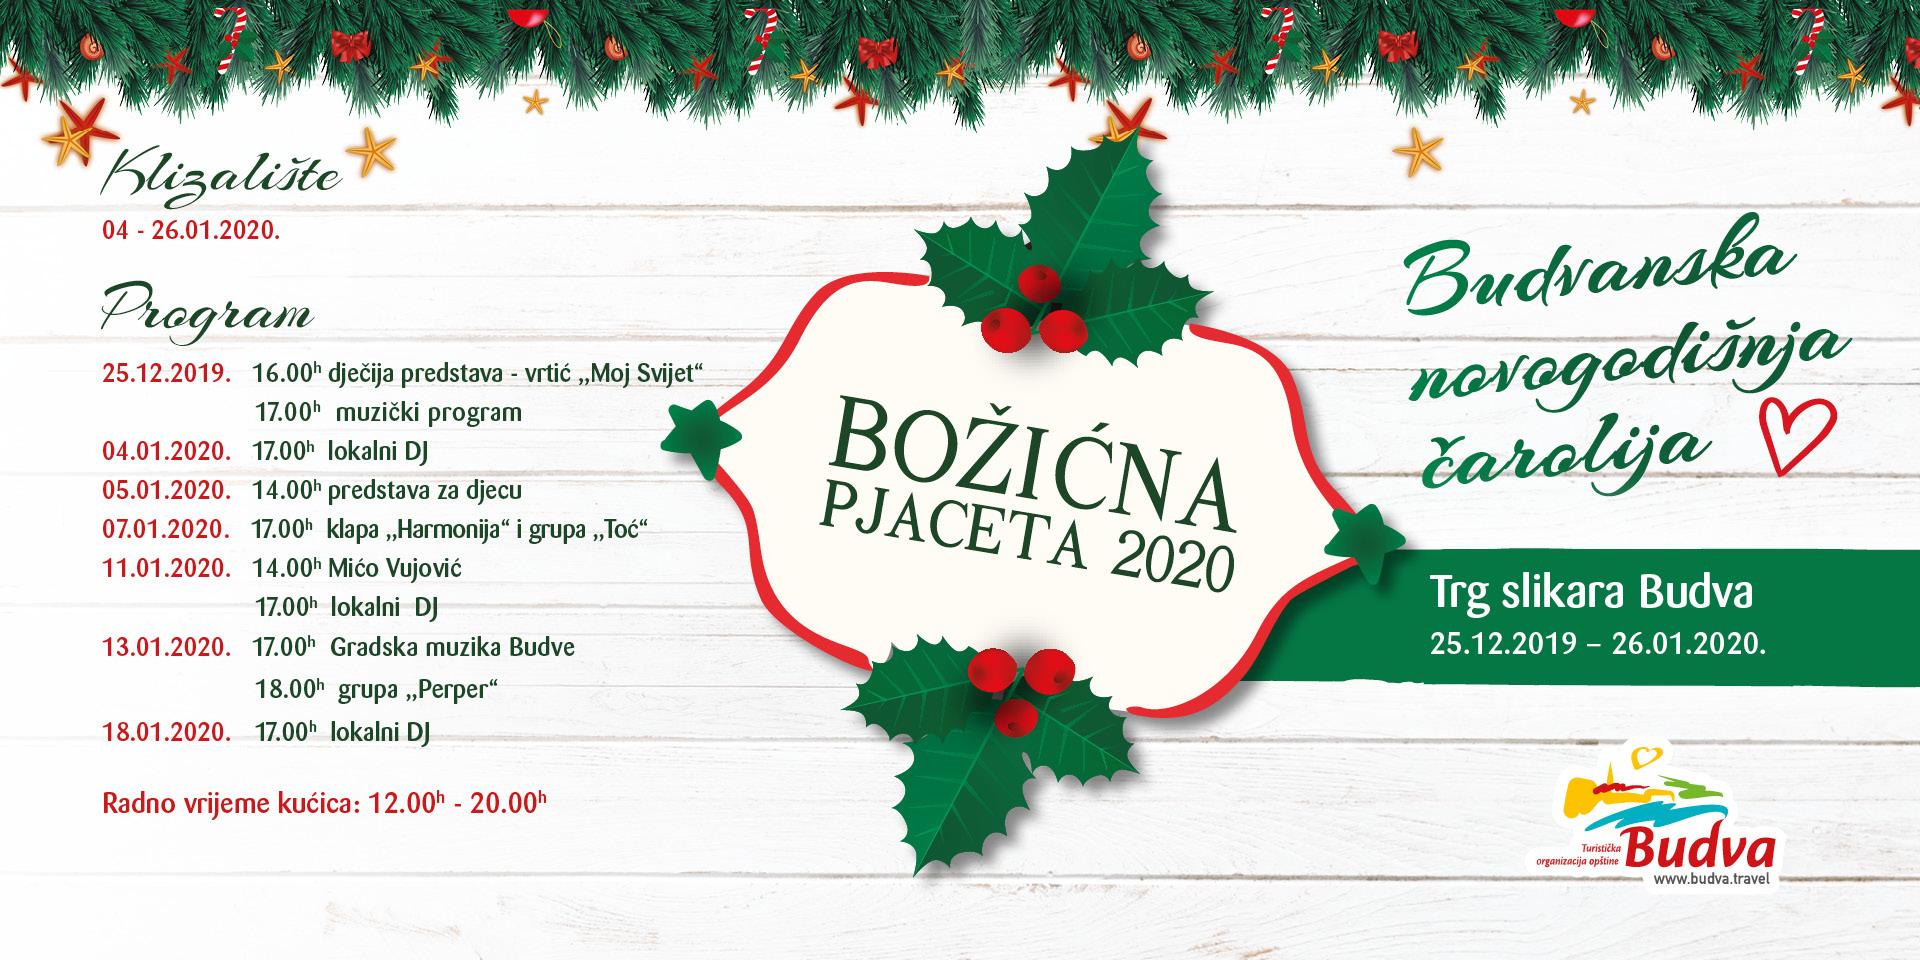 budva-hostels budva-activities budva adriatic-sea budva-nightlife